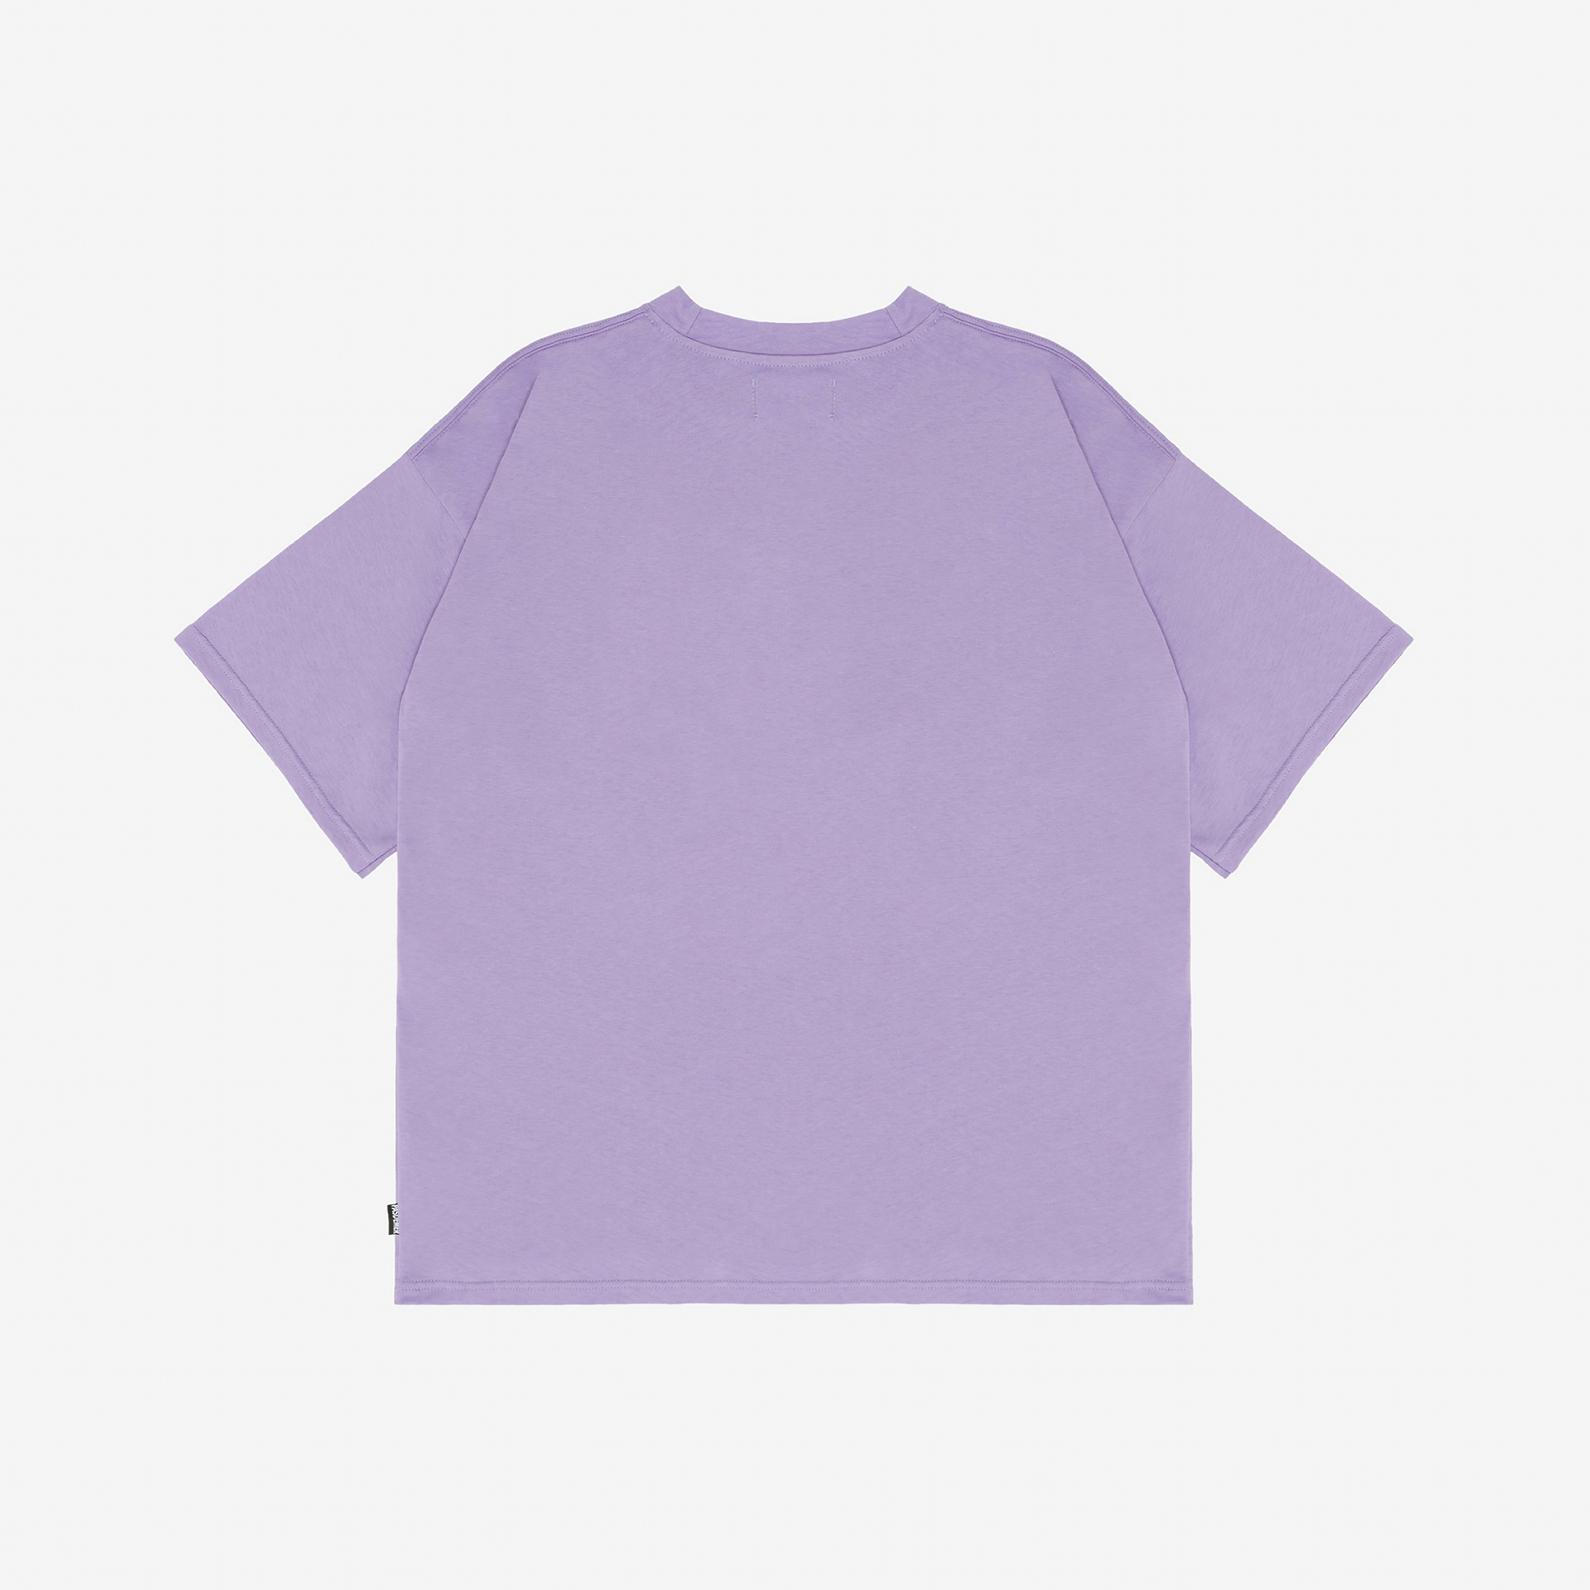 【PAS DE MER/パドゥメ】HIGH COUTURE T-SHIRT オーバーサイズTシャツ / LIGHT PURPLE